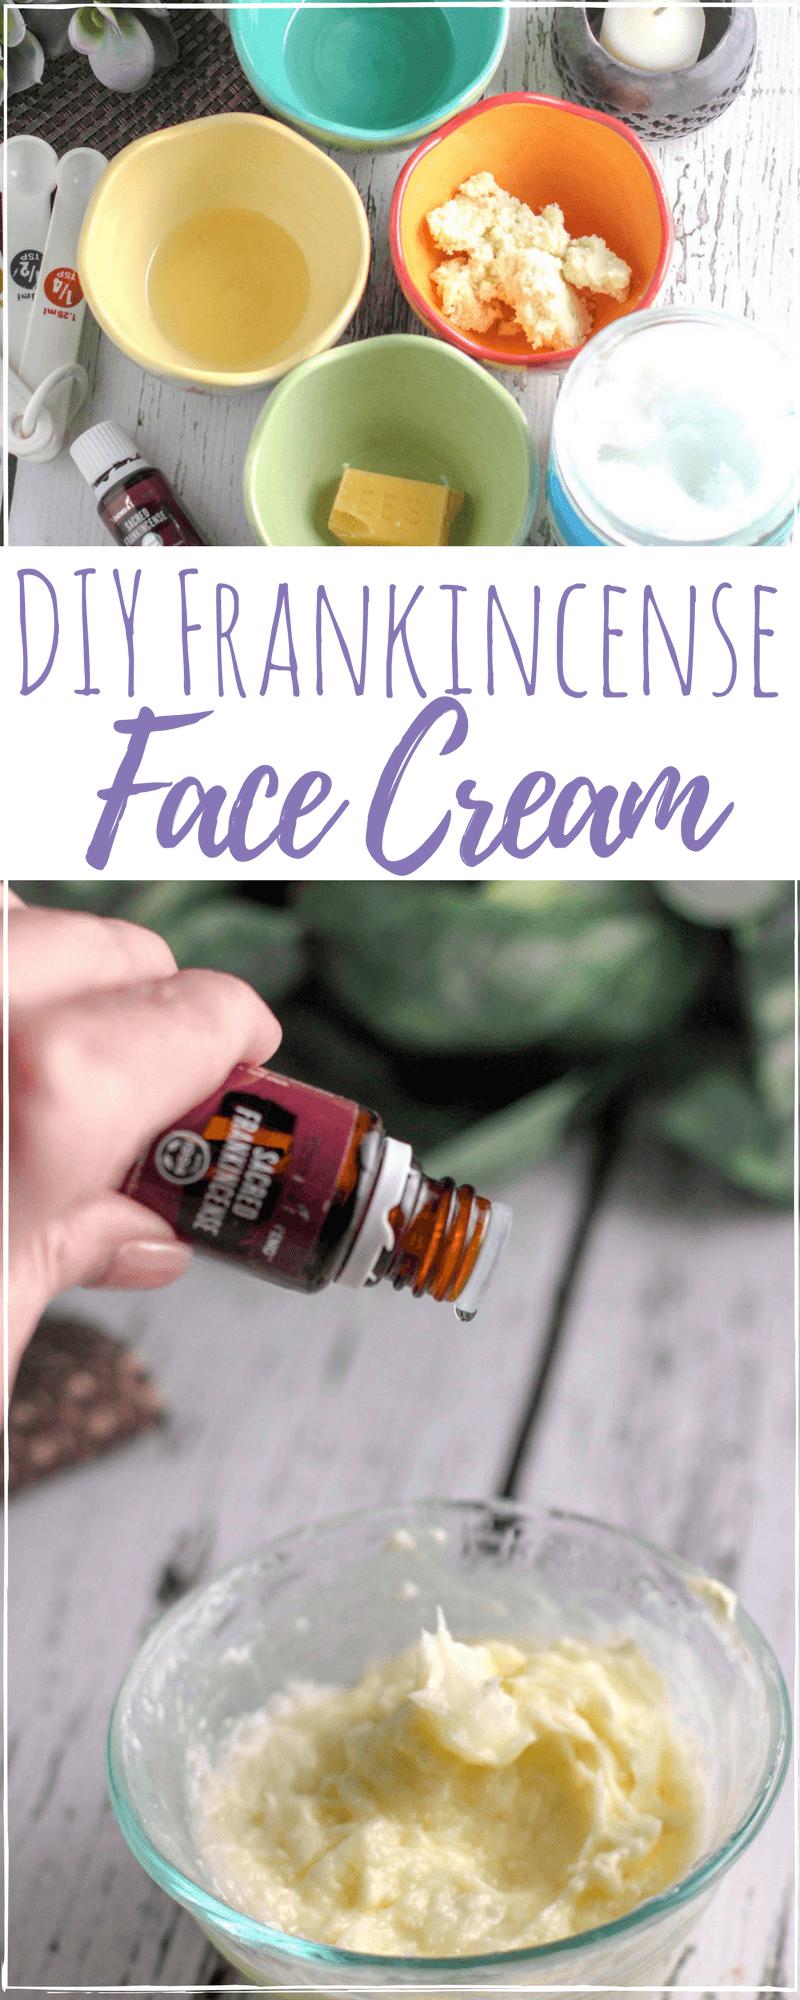 DIY frankincense face cream is the perfect anti-aging skin care you can trust. #antiaging#antiagingcream#AntiWrinkle#diyskincare#moisturizing#skincare